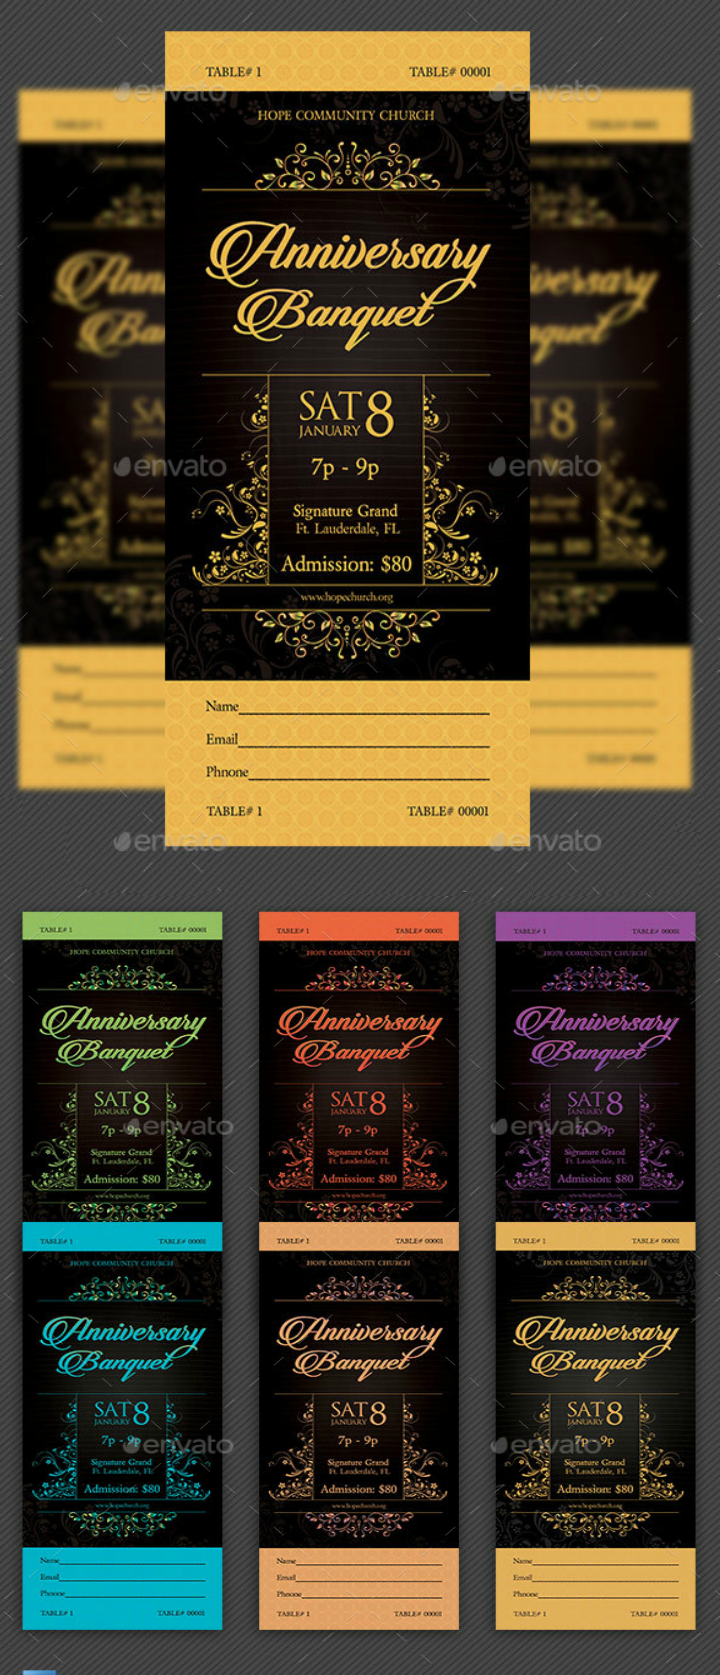 14+ Restaurant Anniversary Invitation Designs & Templates - PSD, AI | Free  & Premium Templates